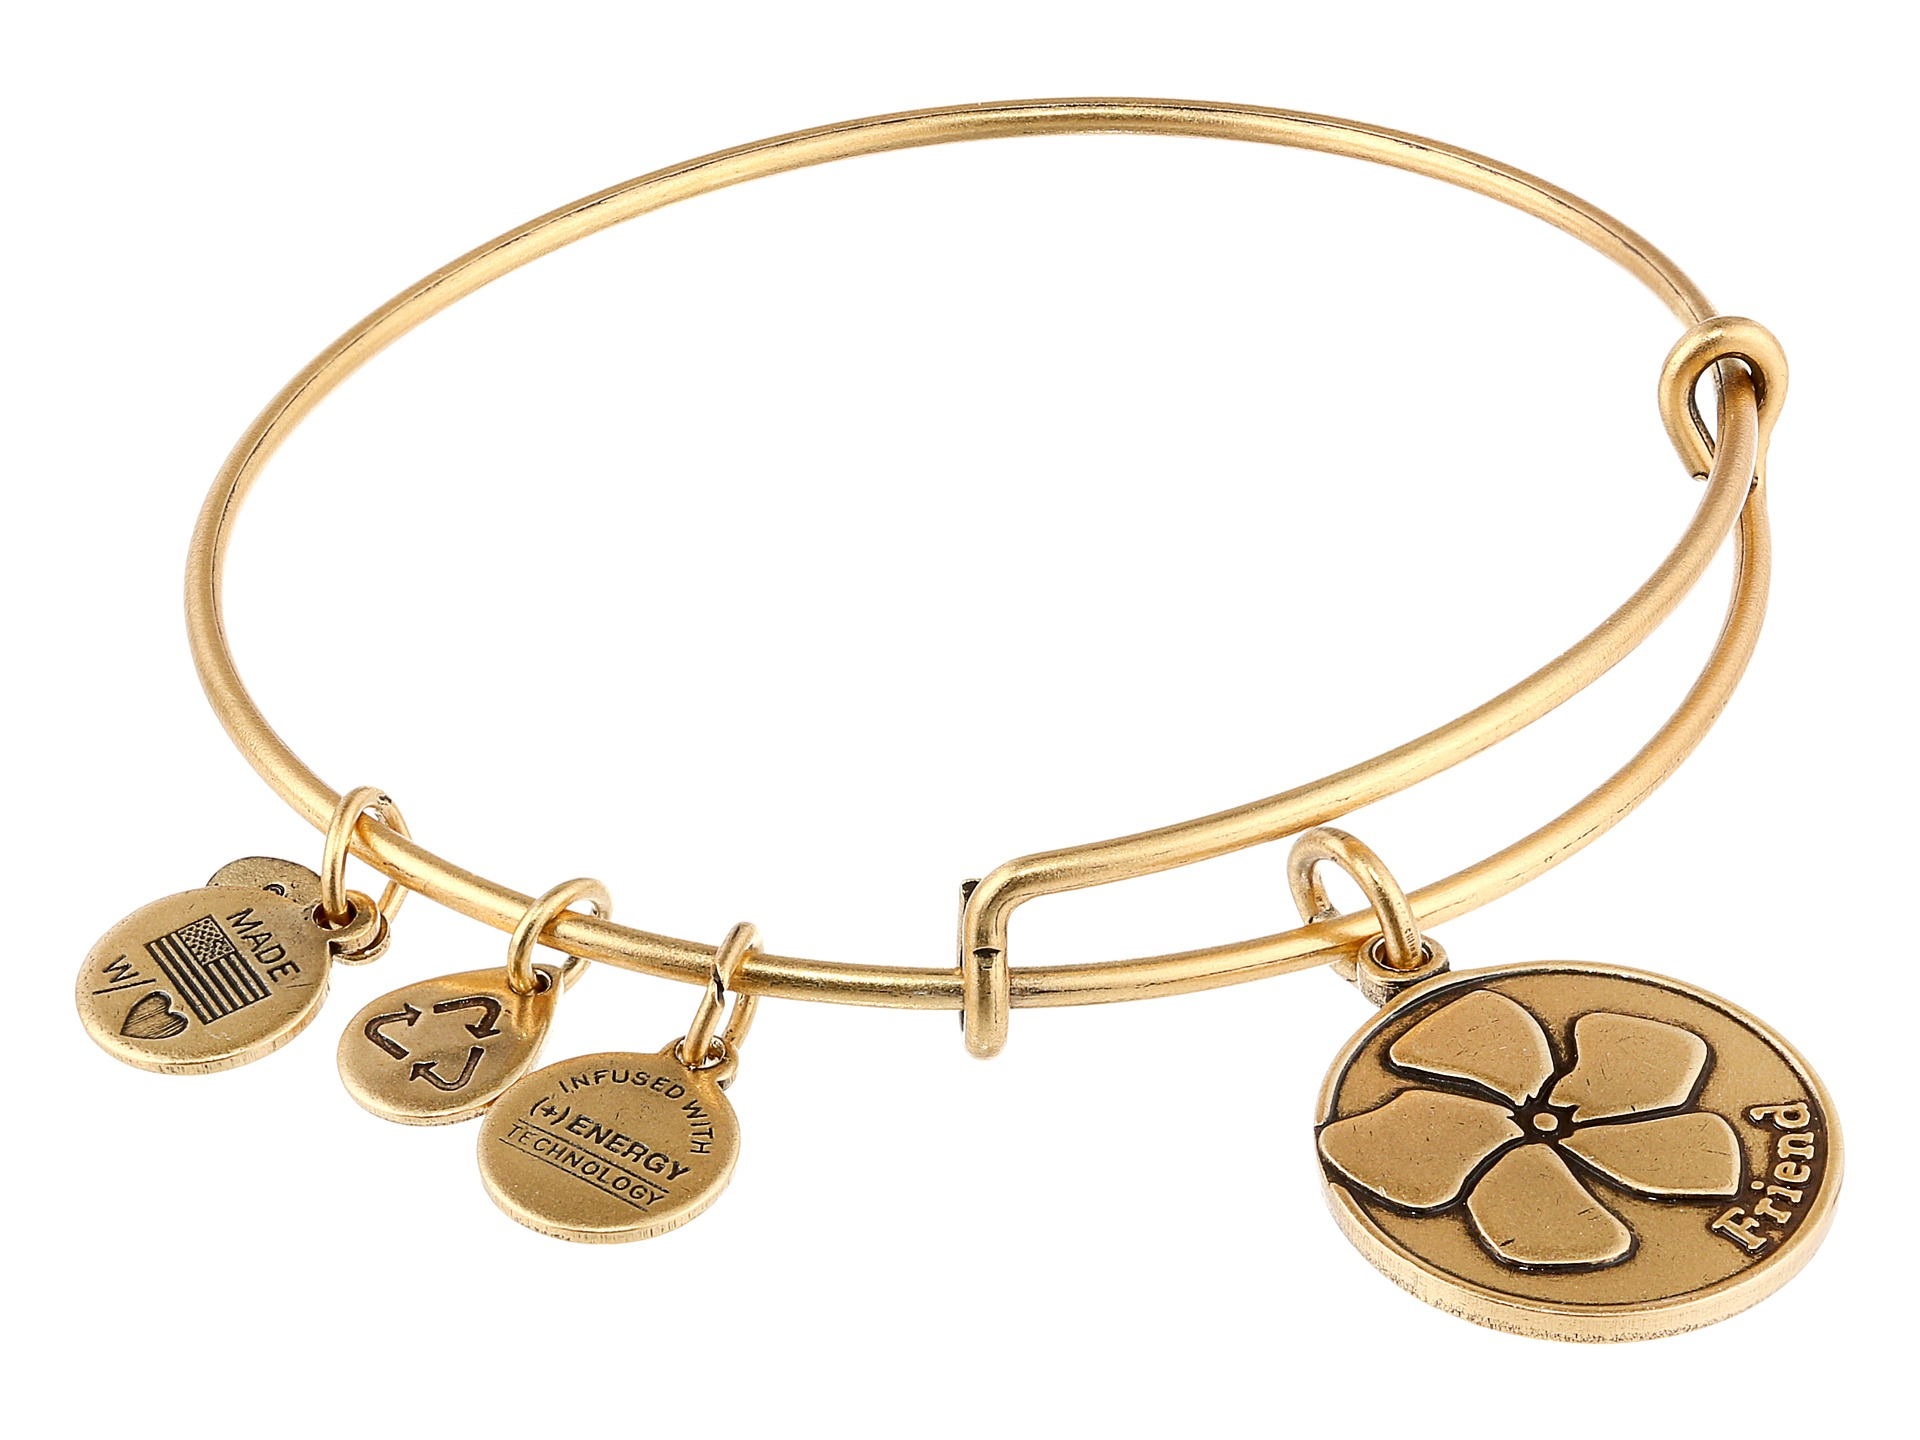 Alex And Ani Friendship Bracelet Uk Best 2018